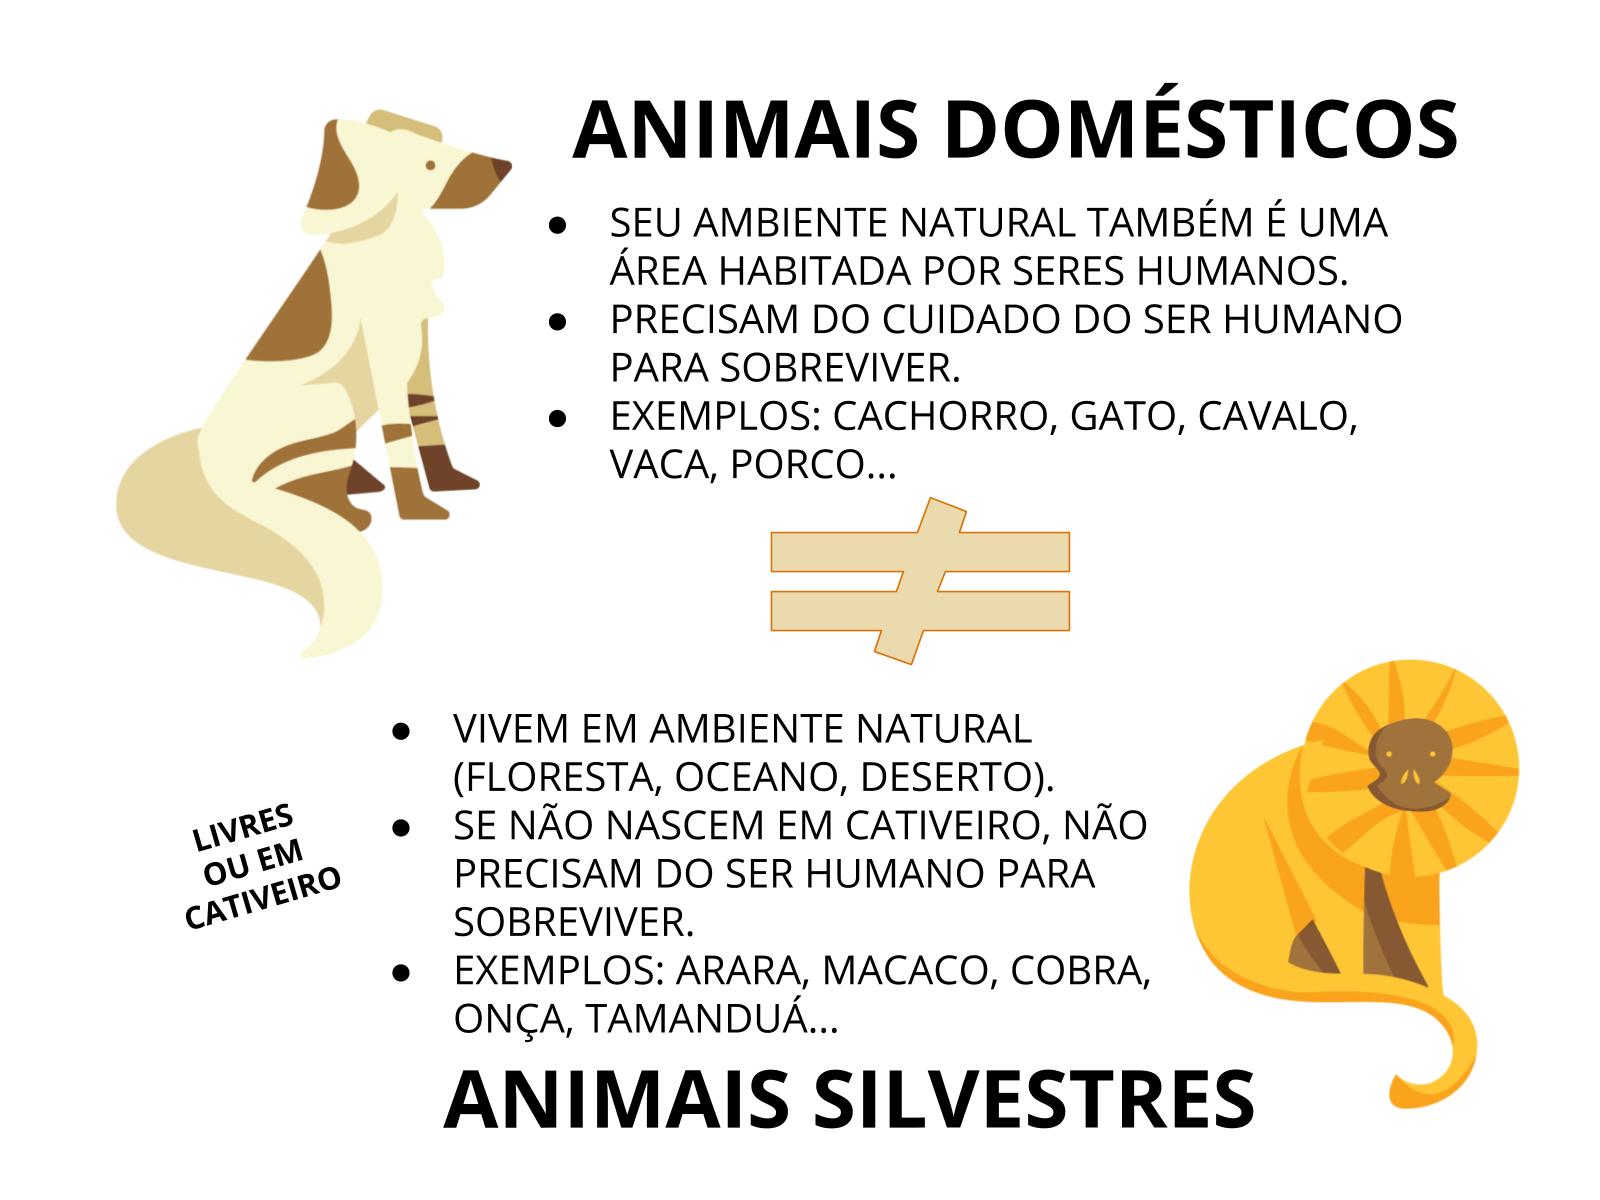 O Mundo Animal: Animais Domésticos e Silvestres